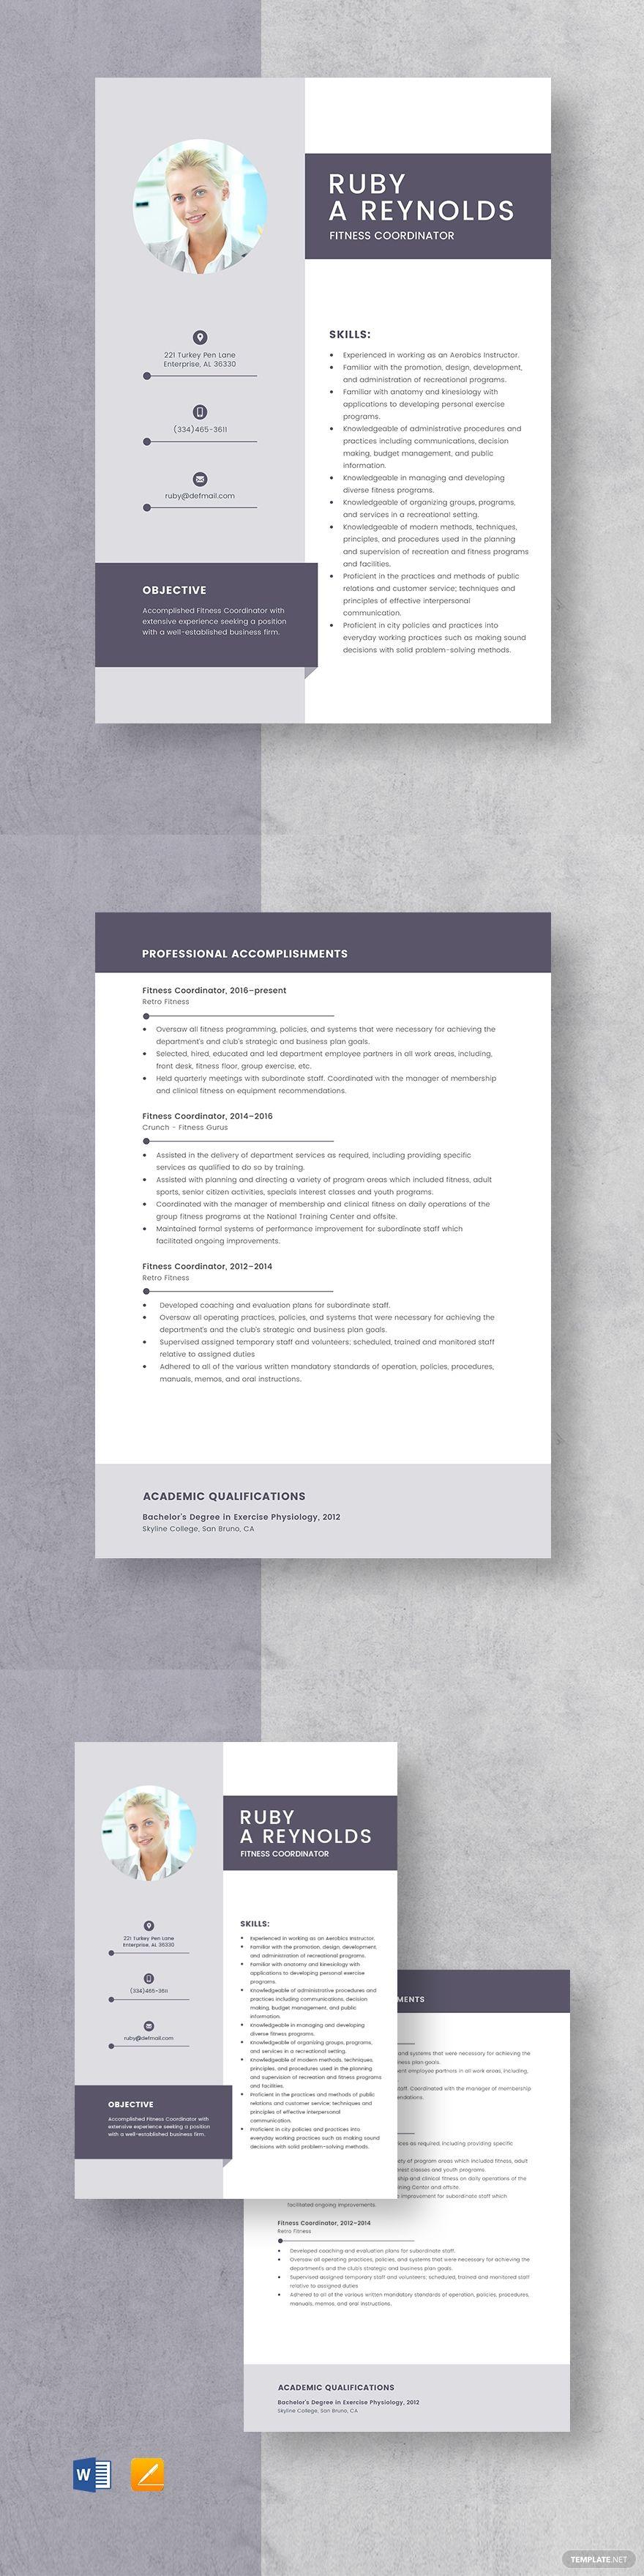 Fitness Coordinator Resume Template #AD, , #AFFILIATE, #Coordinator, #Fitness, #Template, #Resume